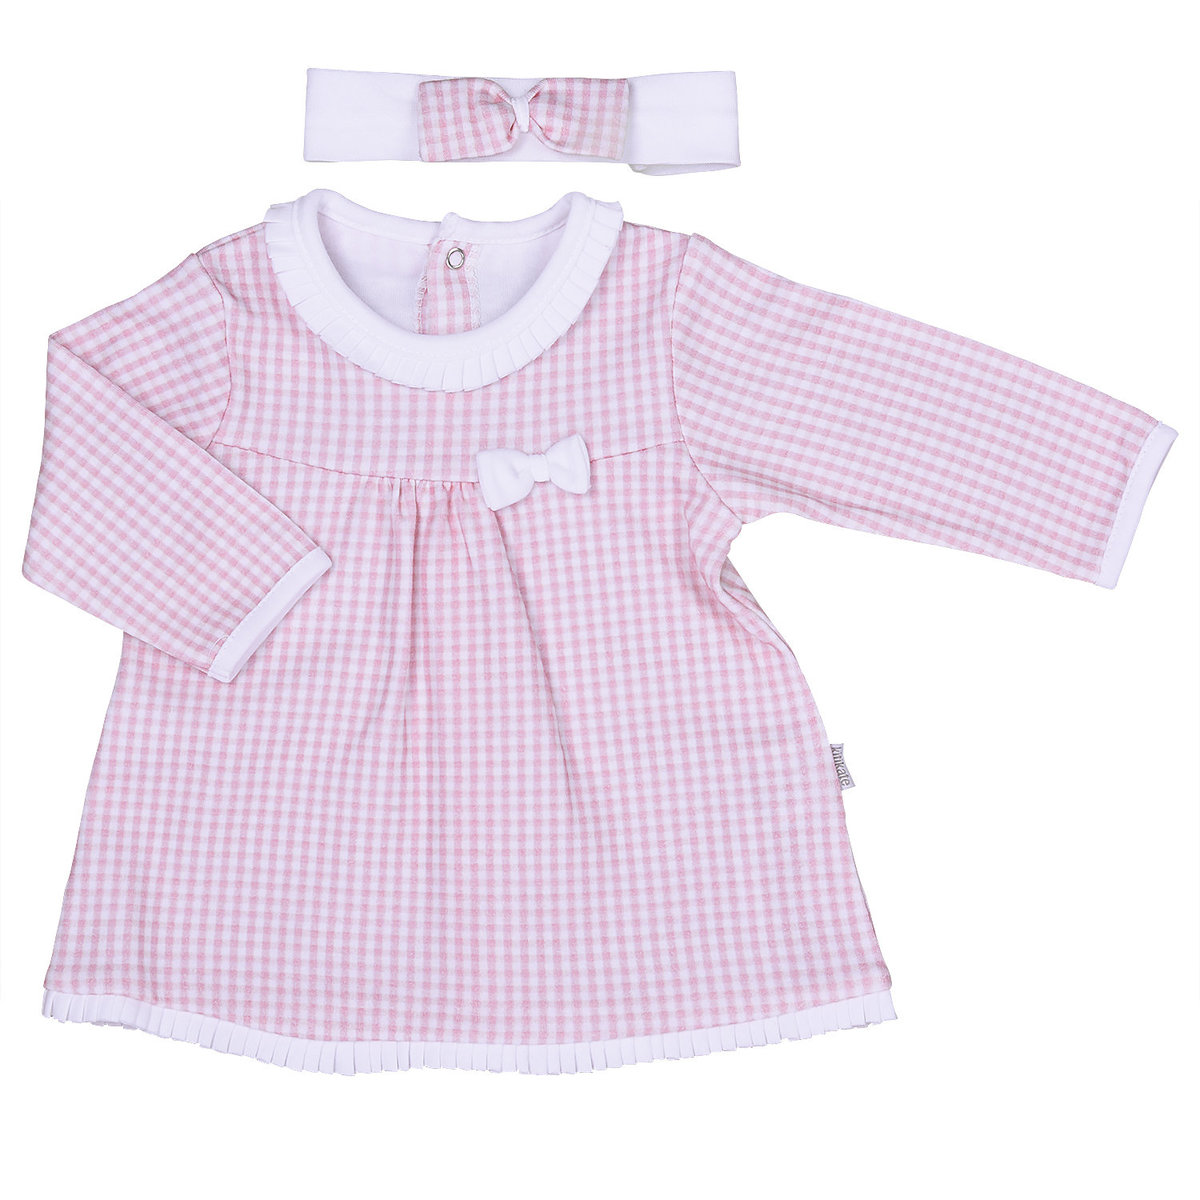 Organic Cotton Long Sleeve Dress With Headwear (1-3M)